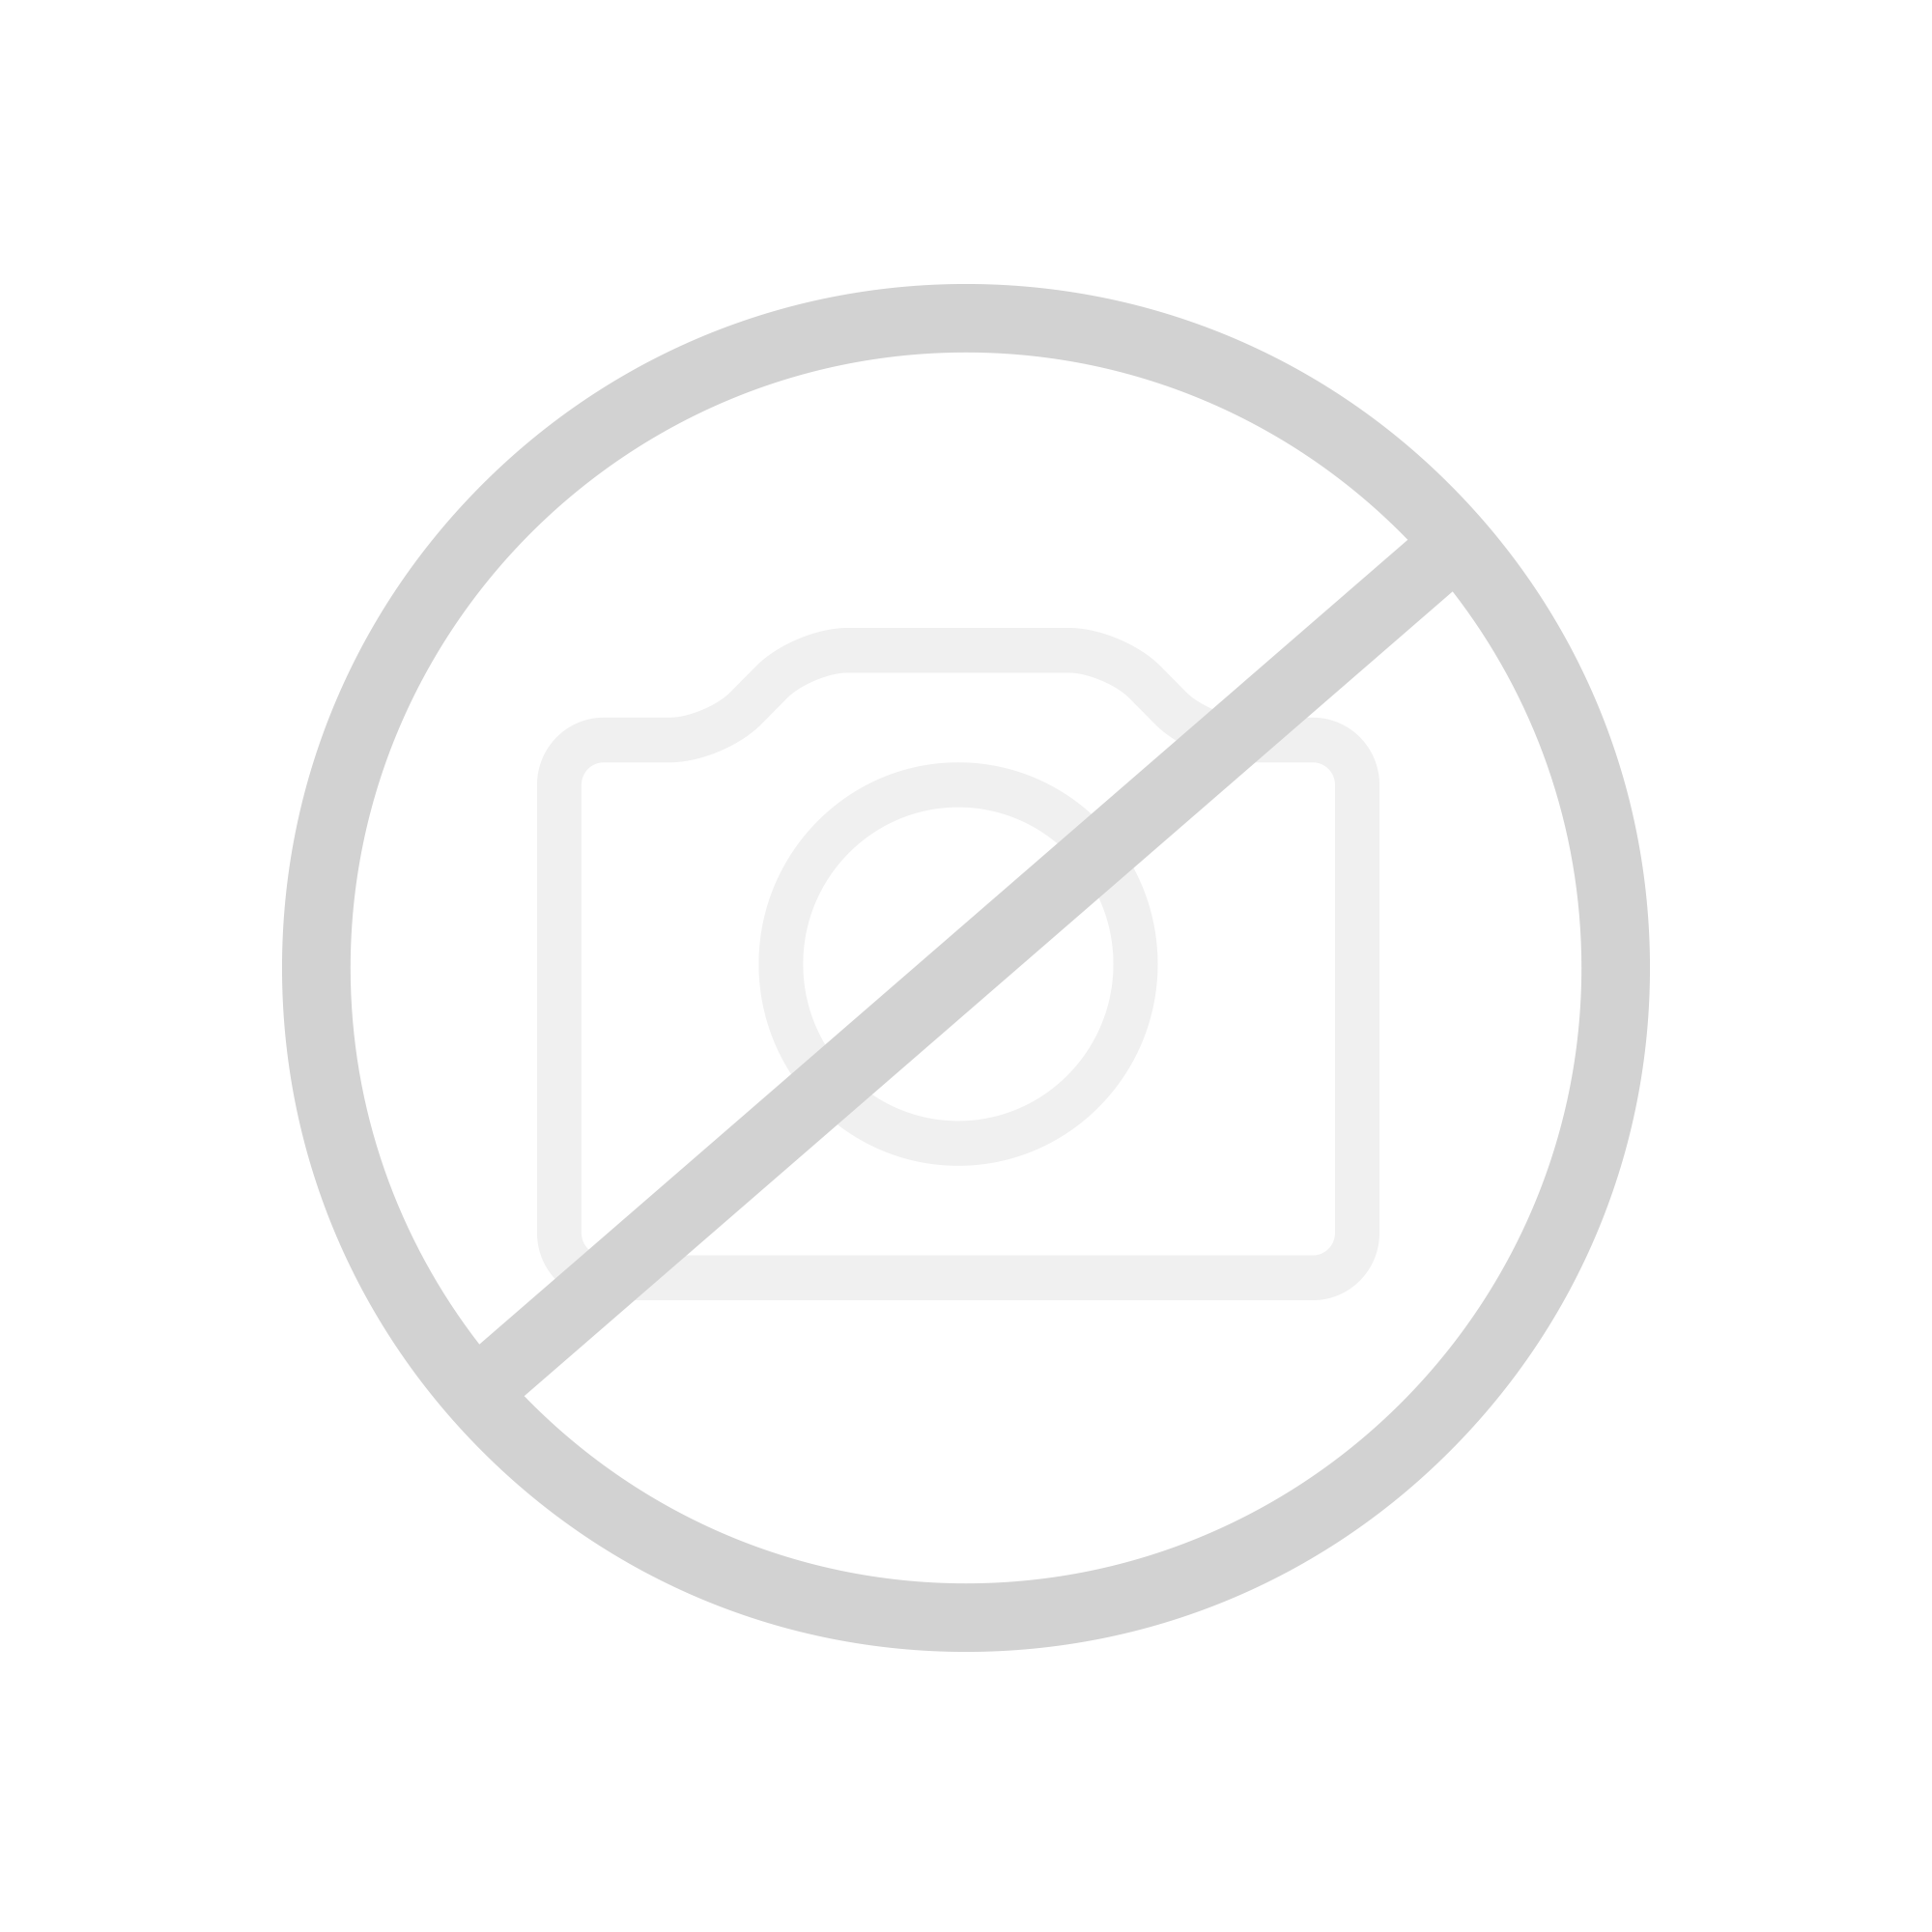 Großartig Gis trockenbau – Eckventil waschmaschine CX93